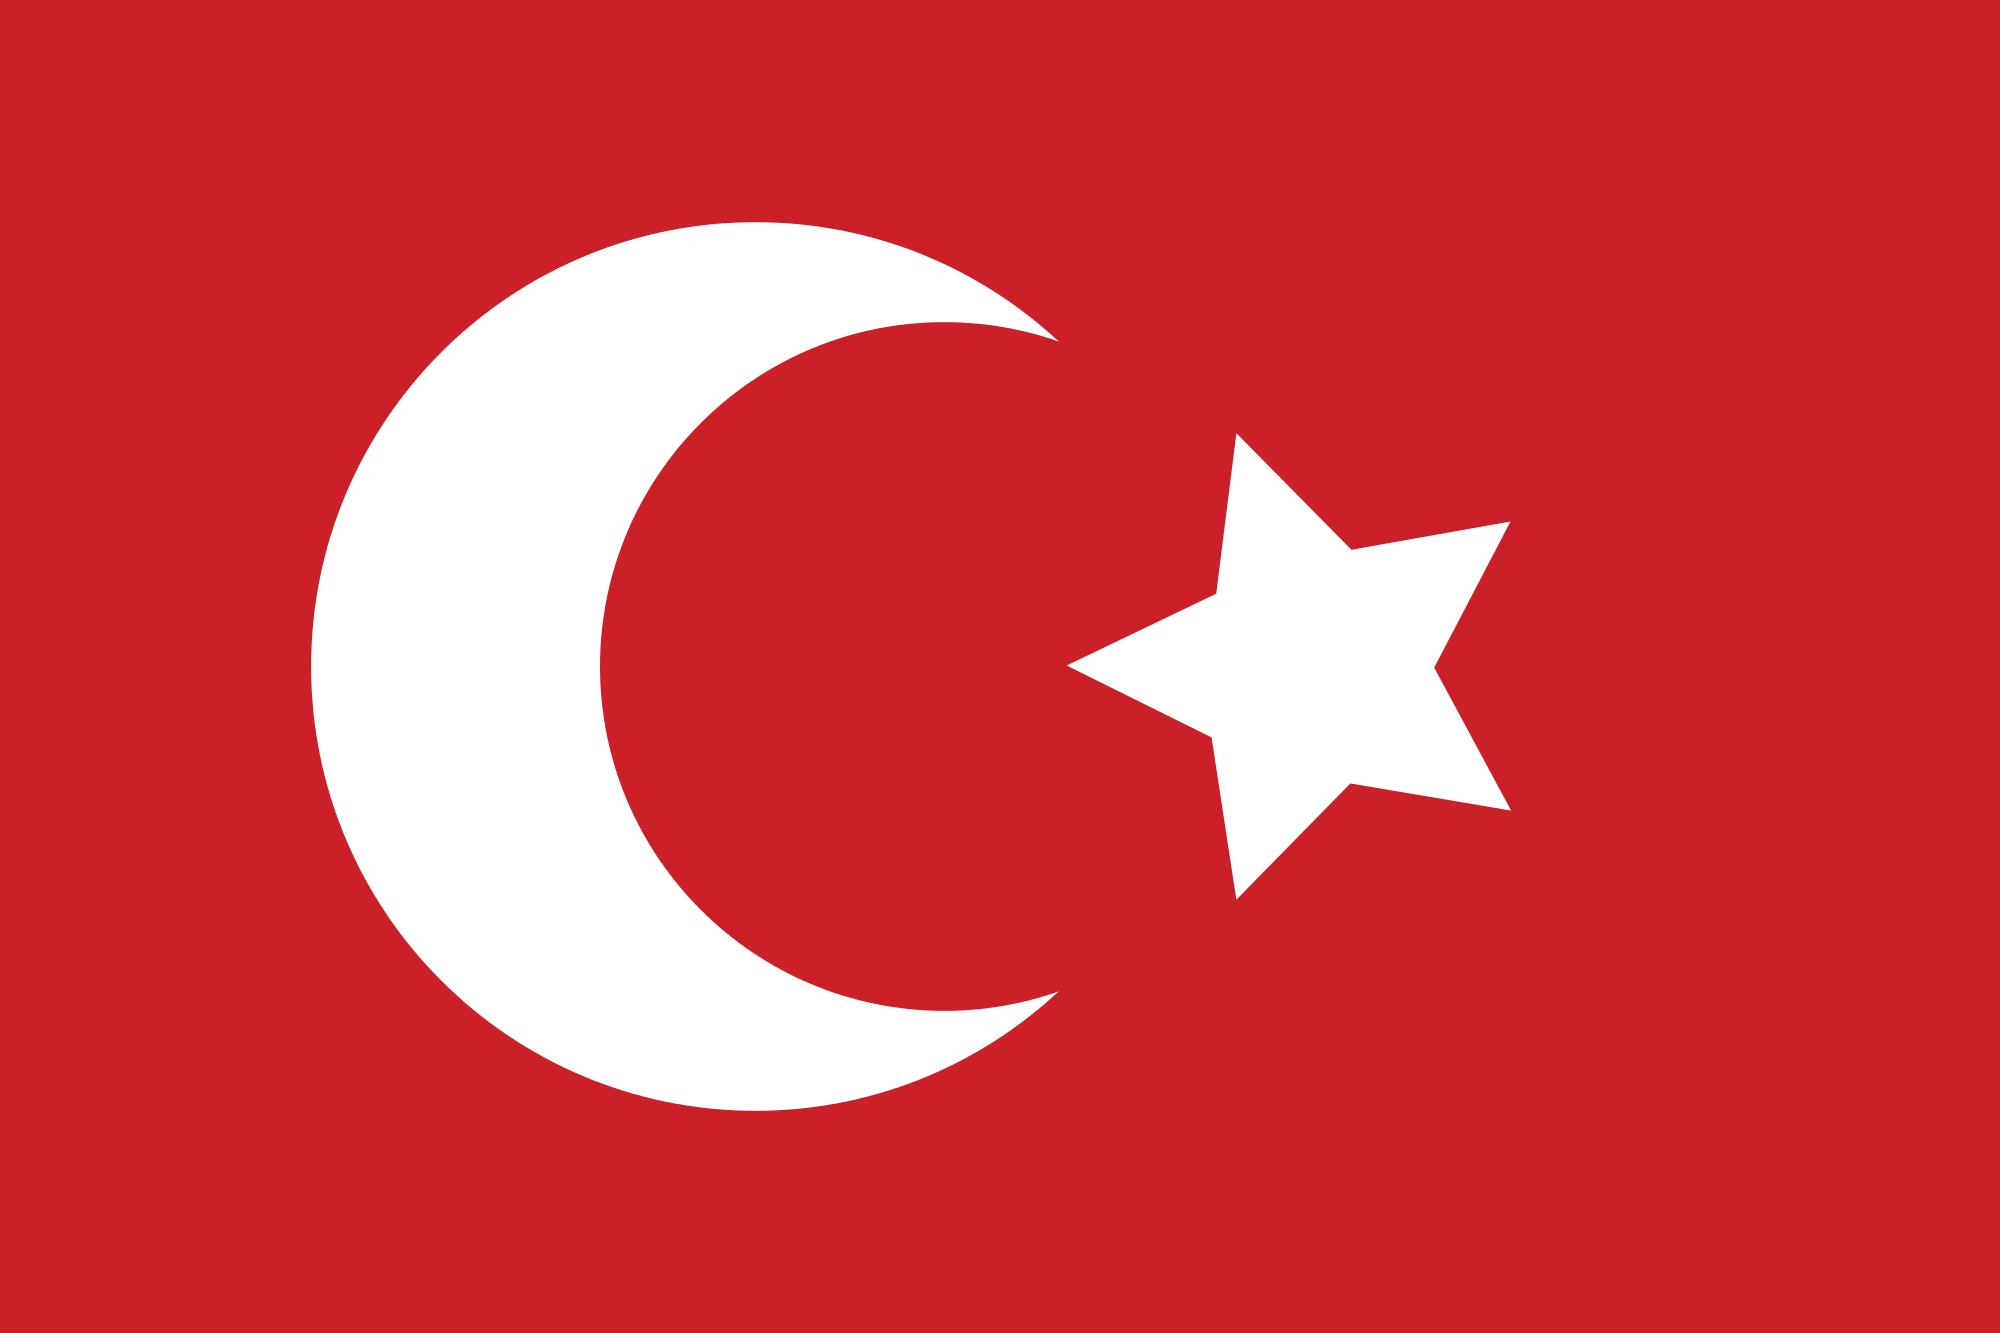 República Helénica (MNI)